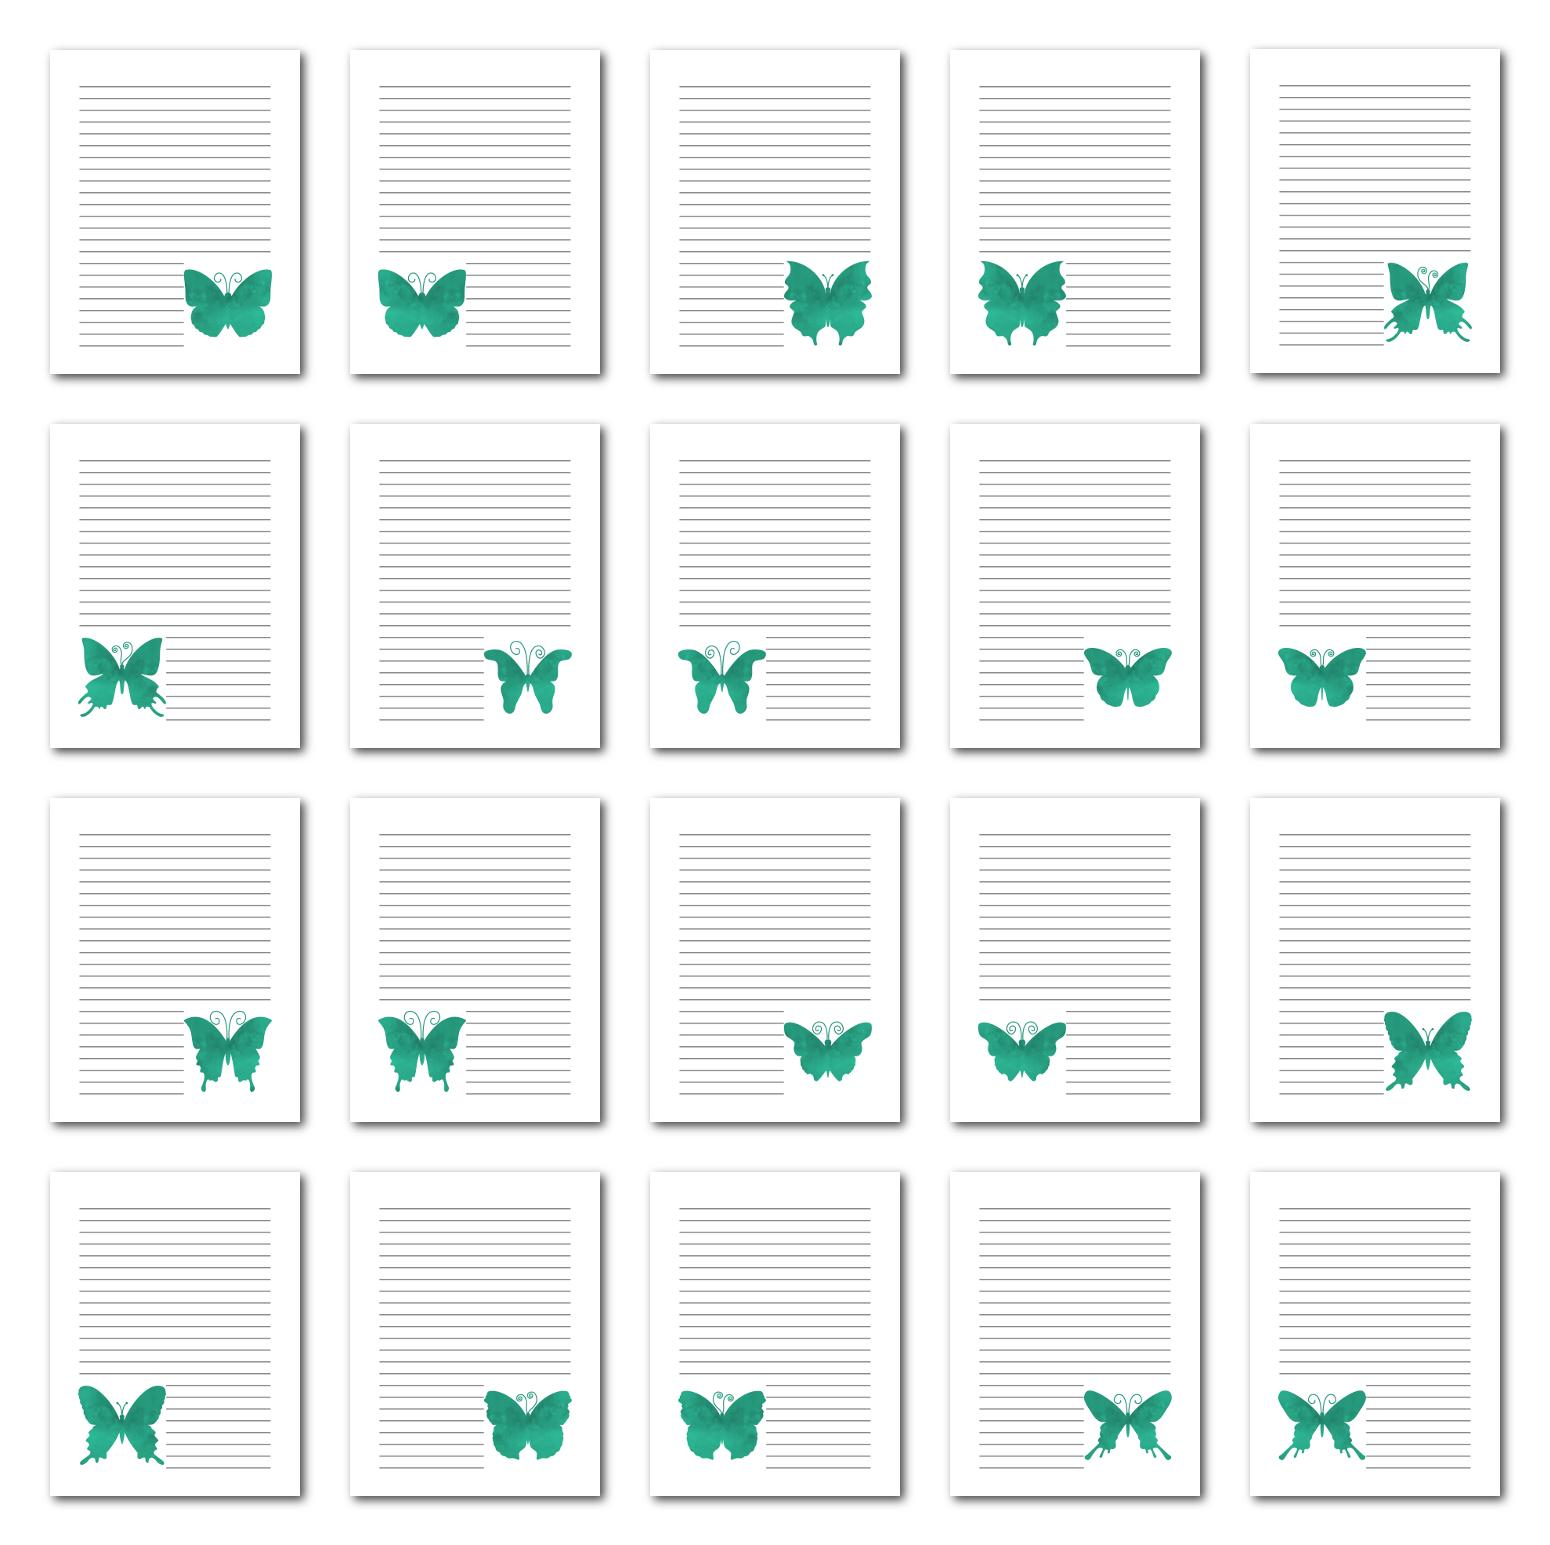 Zen PLR Journal Templates Light Watercolor Butterflies Turquoise Digital Journal Pages